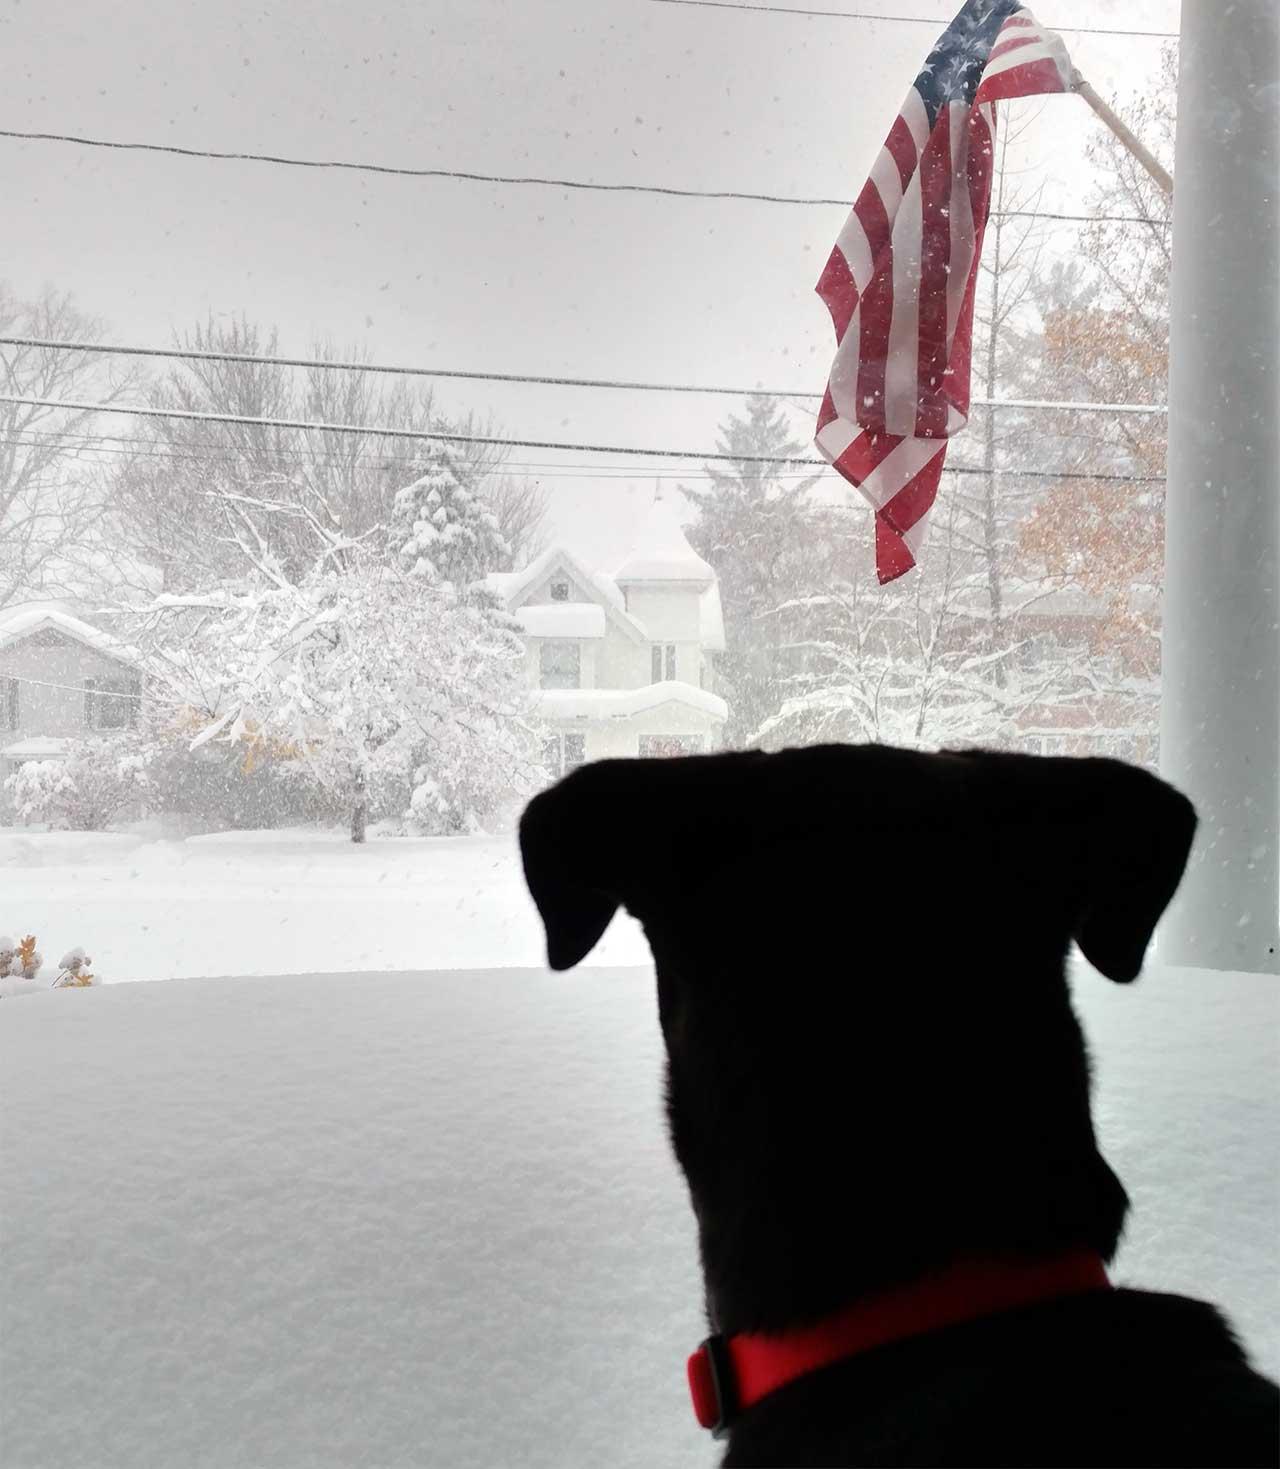 Snow Day in Seneca Falls